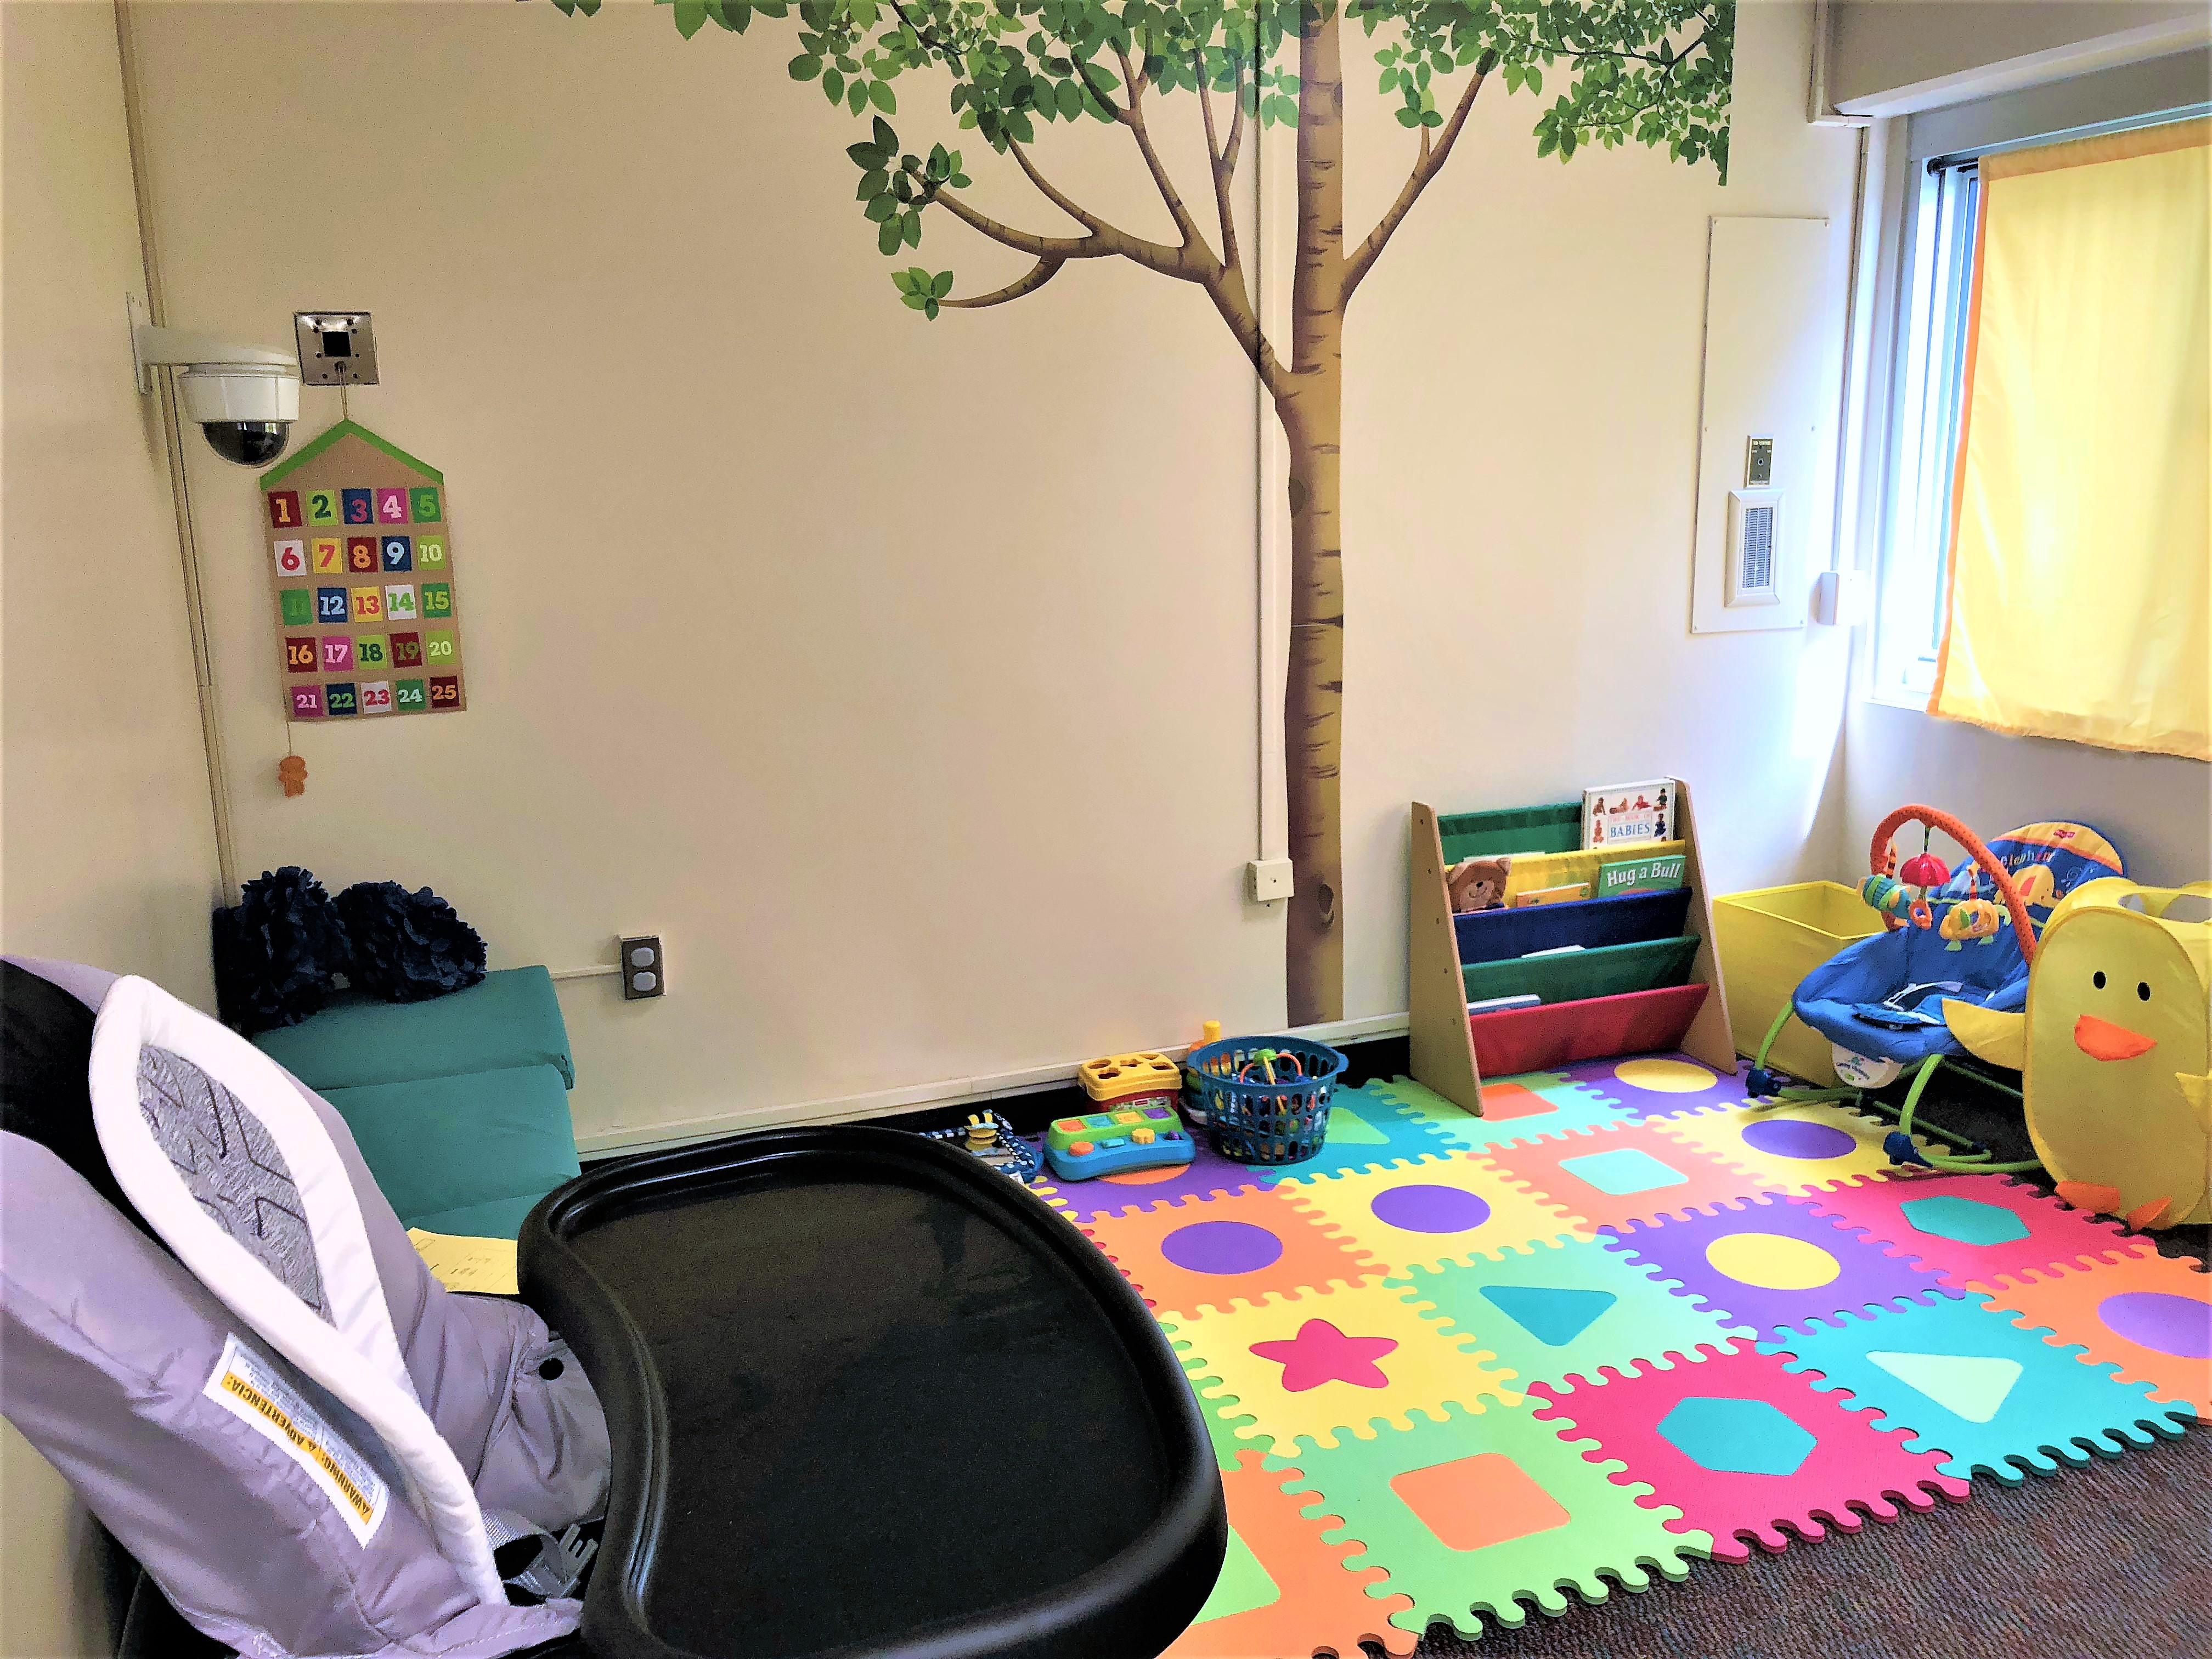 6 Month Baby Lab Visit